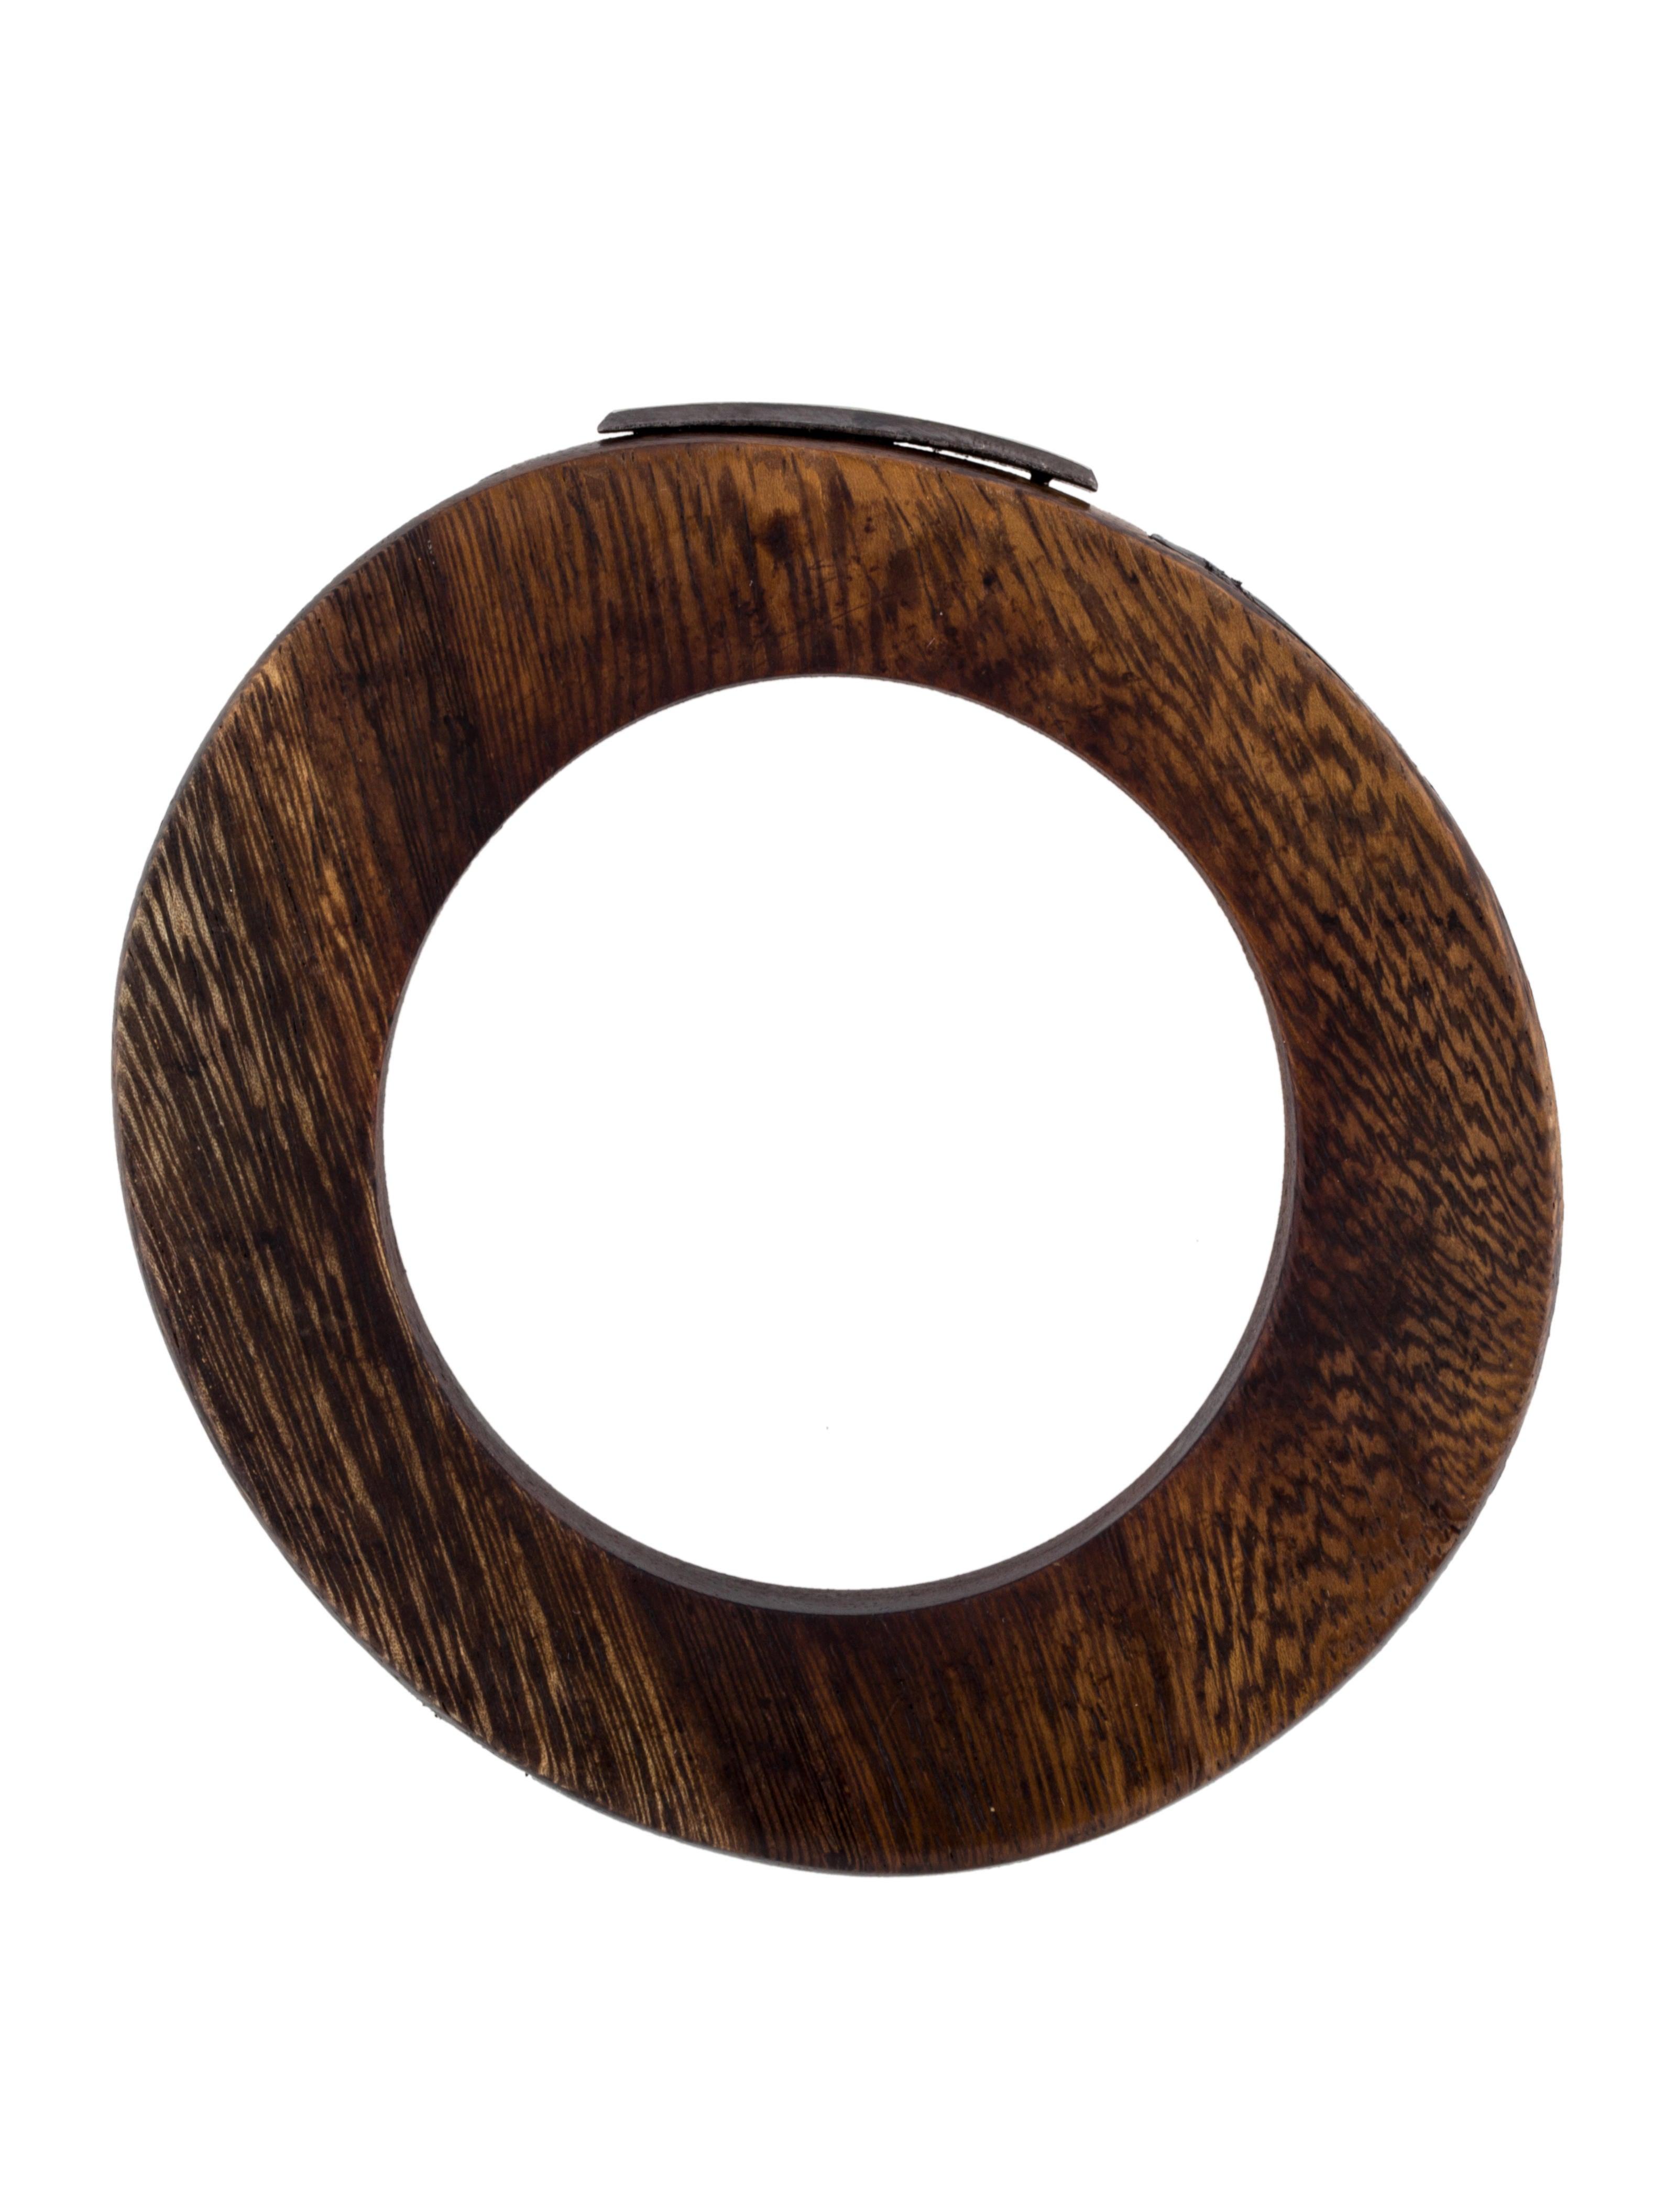 burberry wooden bangle bracelets bur45417 the realreal